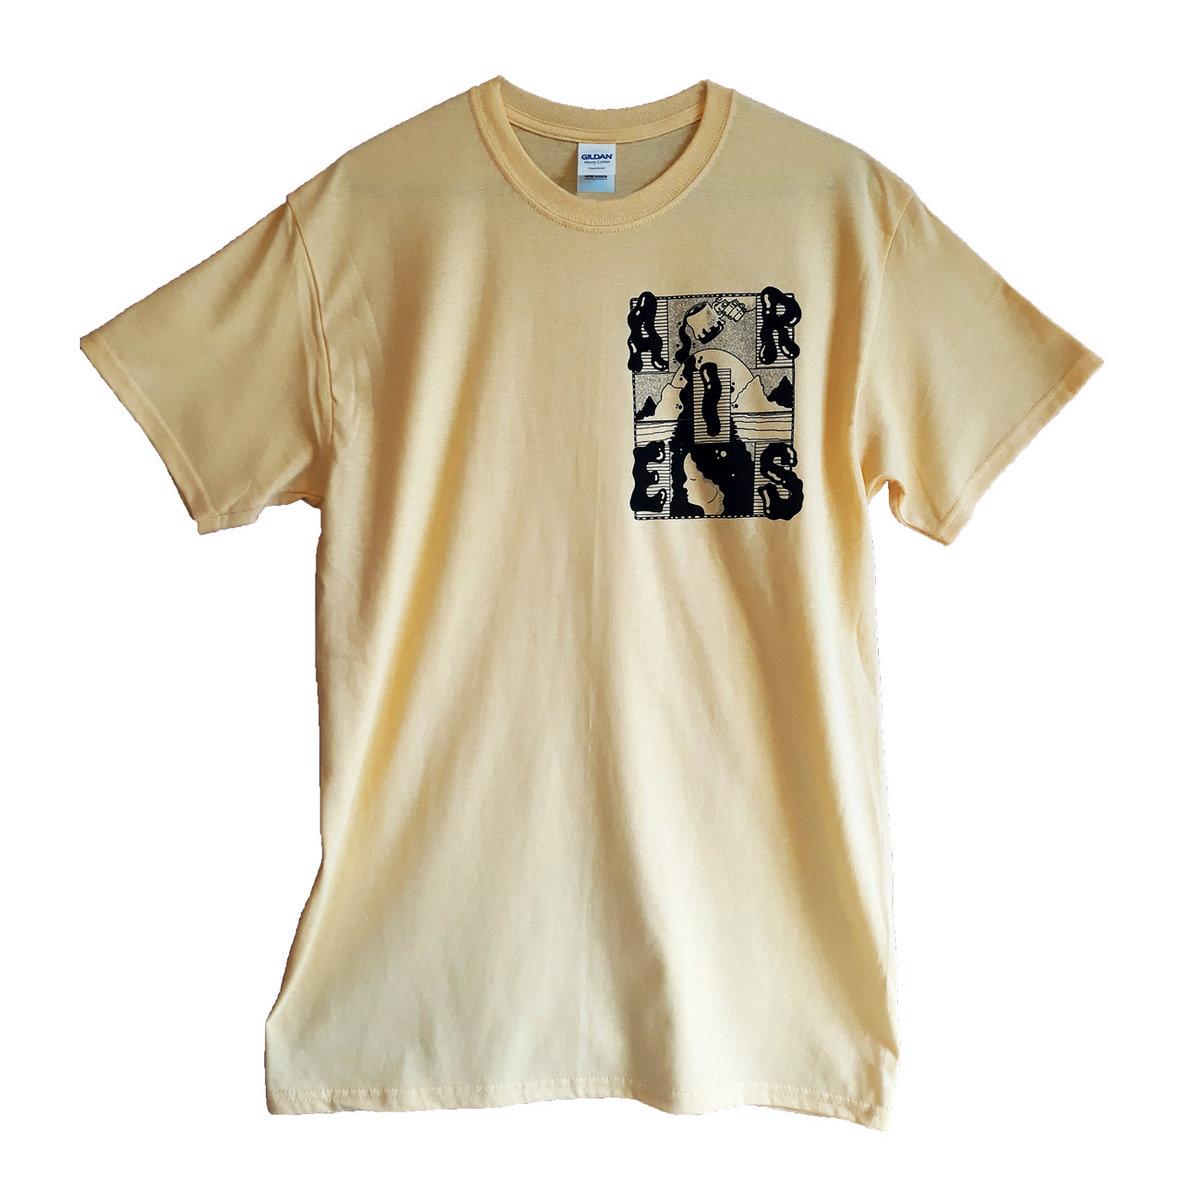 3bb449e5a2a3 Aries Short Sleeve *Yellow Haze* Tee/Cami: • Gildan Heavy Cotton *Yellow  Haze* Long Sleeve Tee (Black Printing) • Camistea manga larga *Yellow Haze*  ...